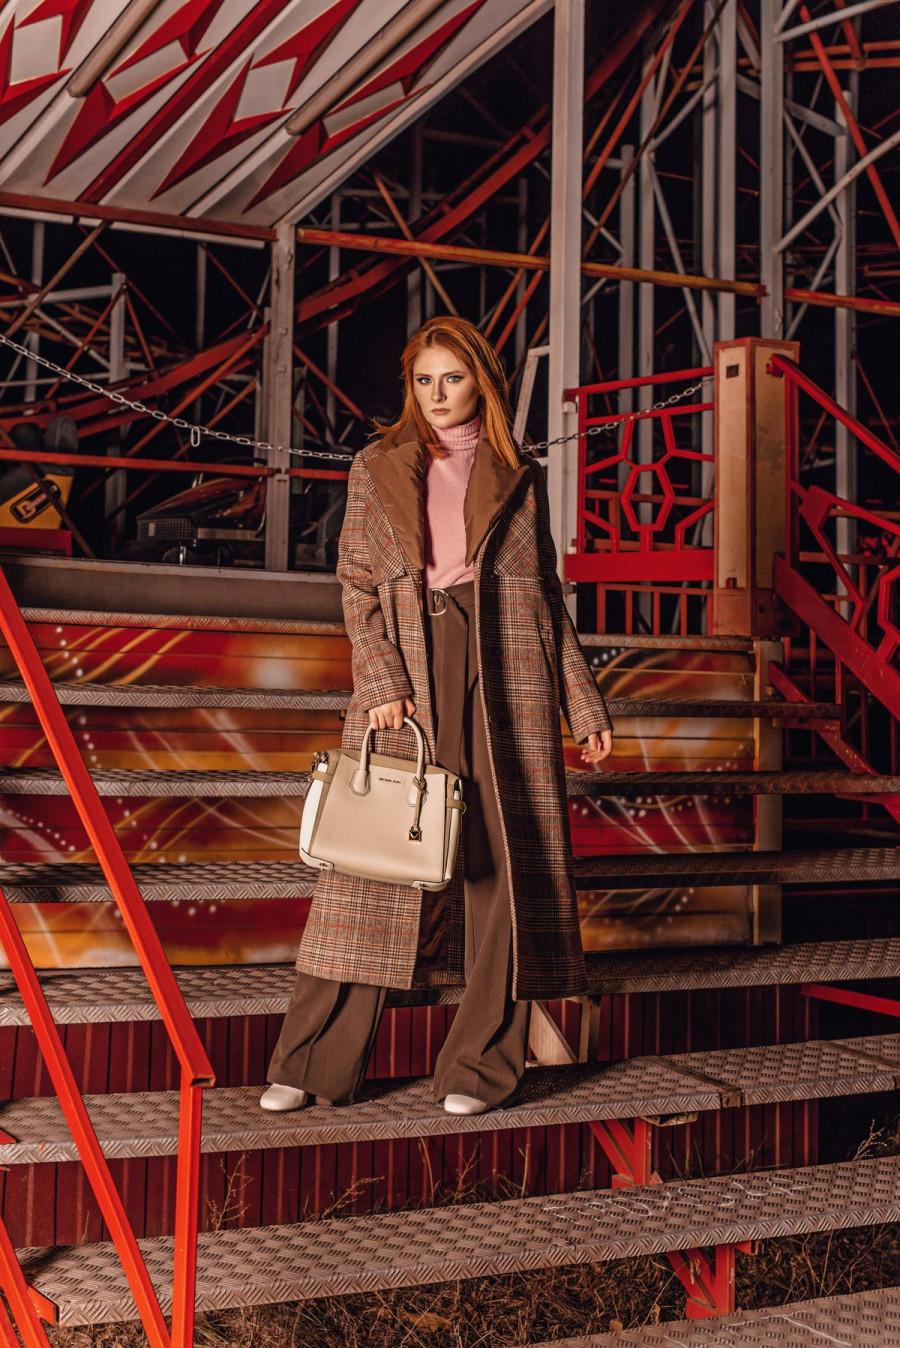 На Диане: пальто Akhmadullina dreams, джемпер Cristina Effe, брюки Cristina Effe, обувь Michael Kors, сумка Michael Kors, @ampersand.barnaul